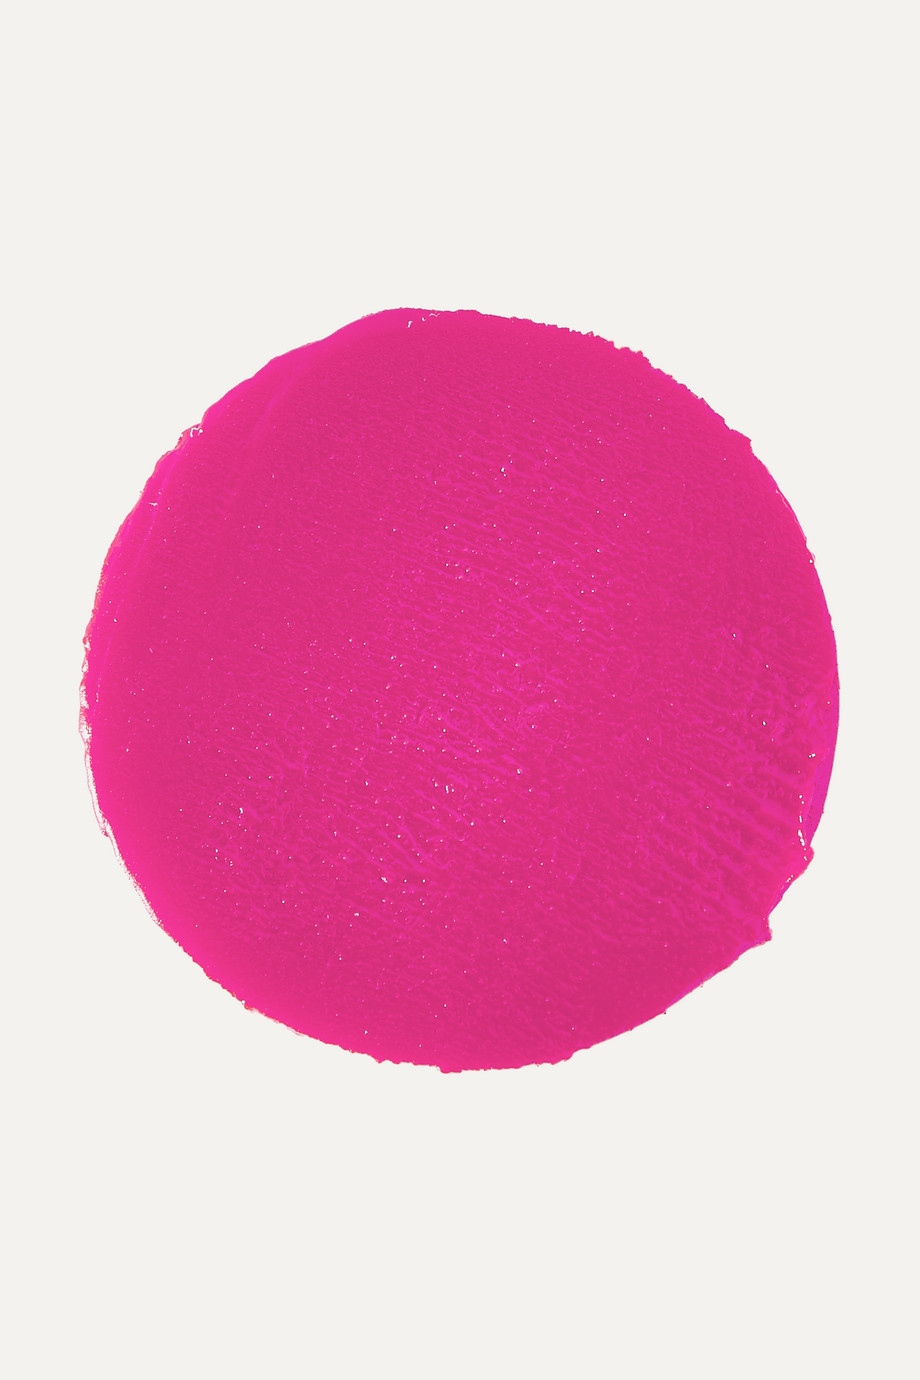 Christian Louboutin Beauty Rouge à lèvres Silky Satin, Pluminette